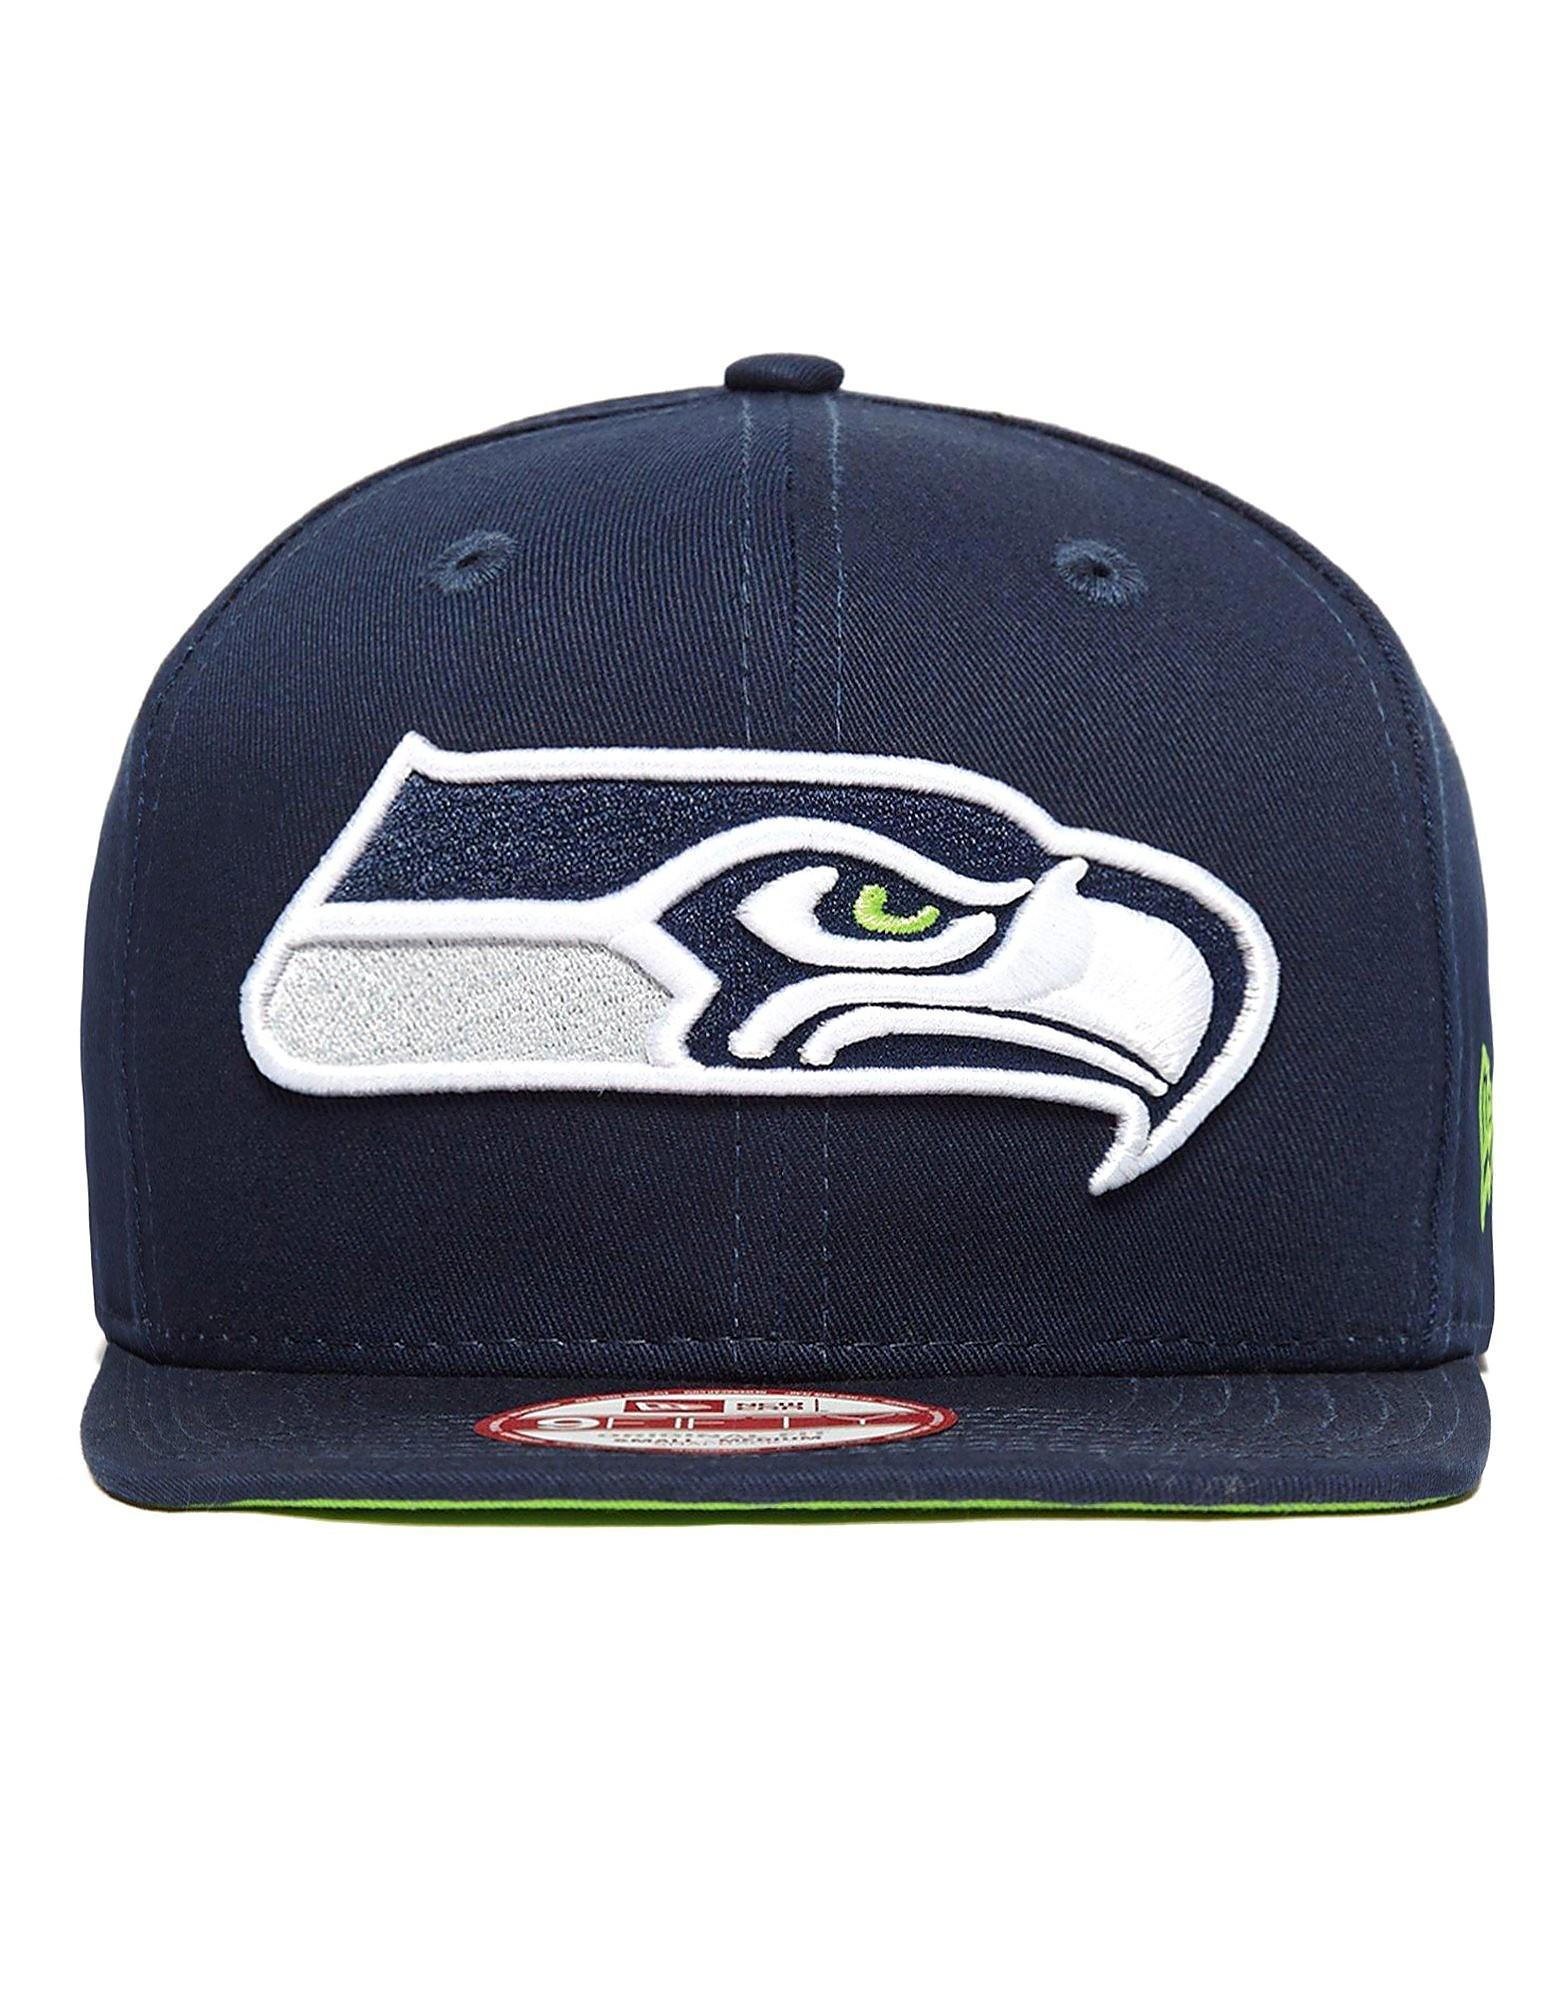 New Era 9FIFTY NFL Seattle Seahawks Snapback Cap